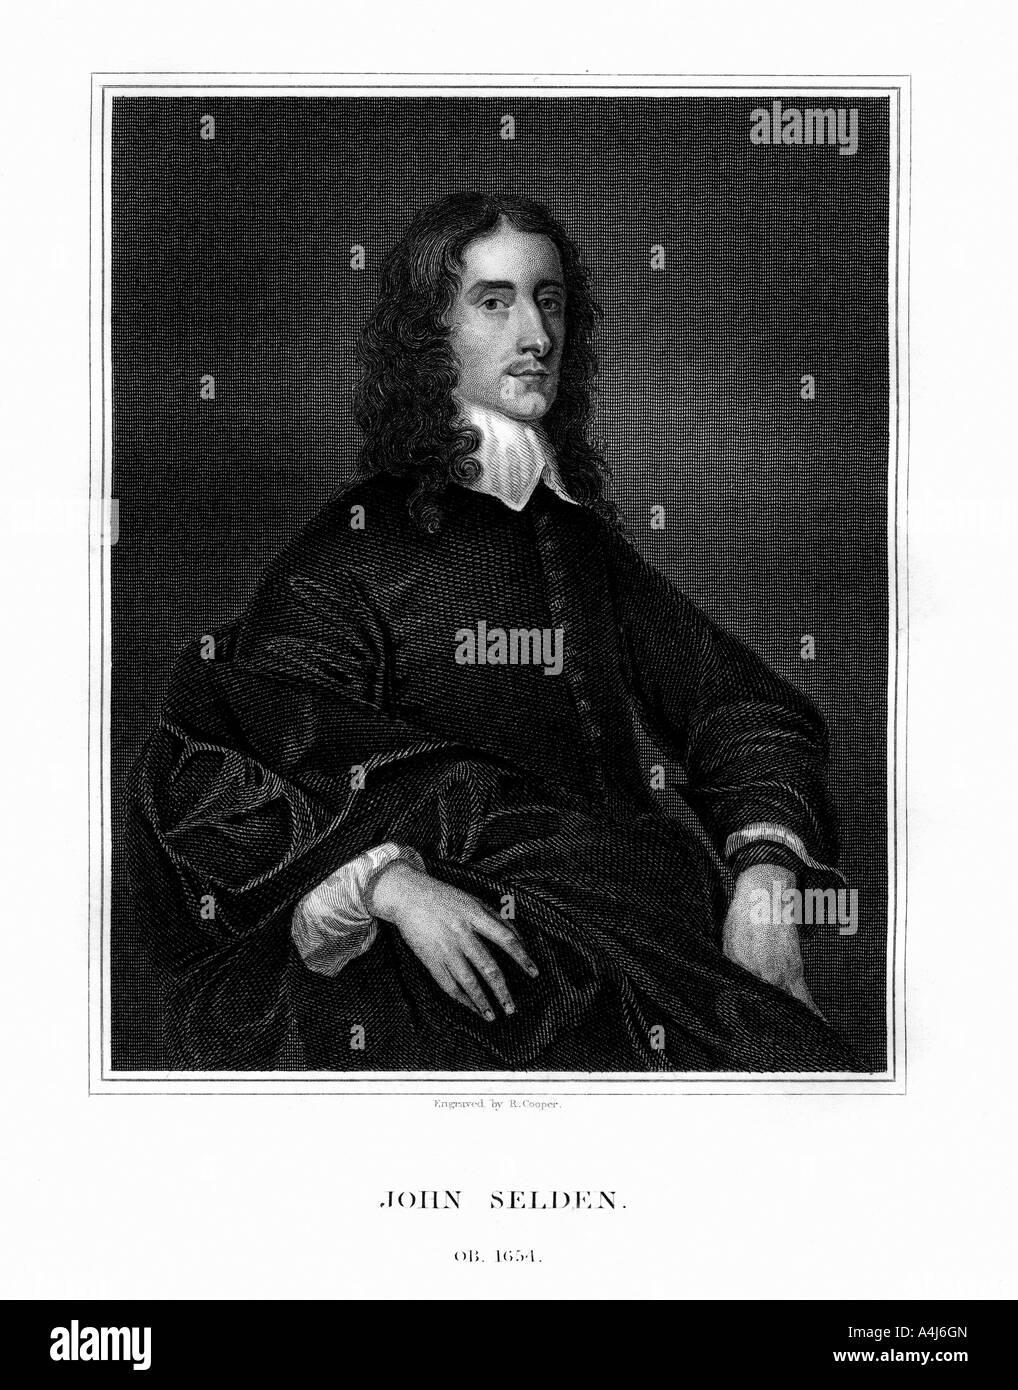 John Selden, English jurist, legal antiquary and oriental scholar, (1823).Artist: R Cooper Stock Photo